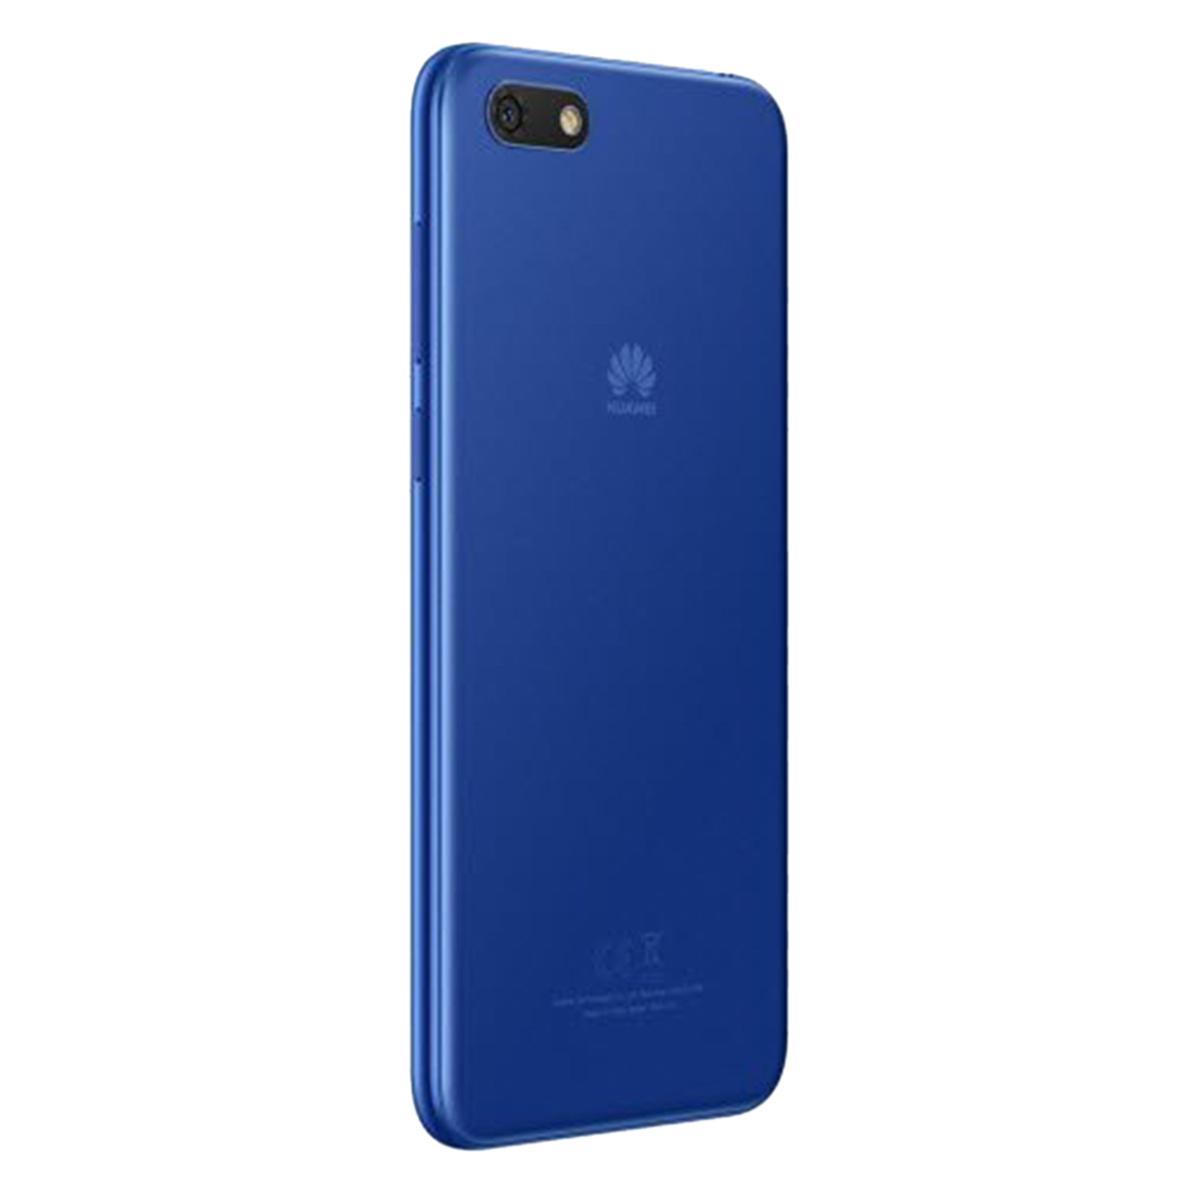 Huawei Y5 Price In Bangladesh - Buy Huawei Y5 Mobile - Daraz